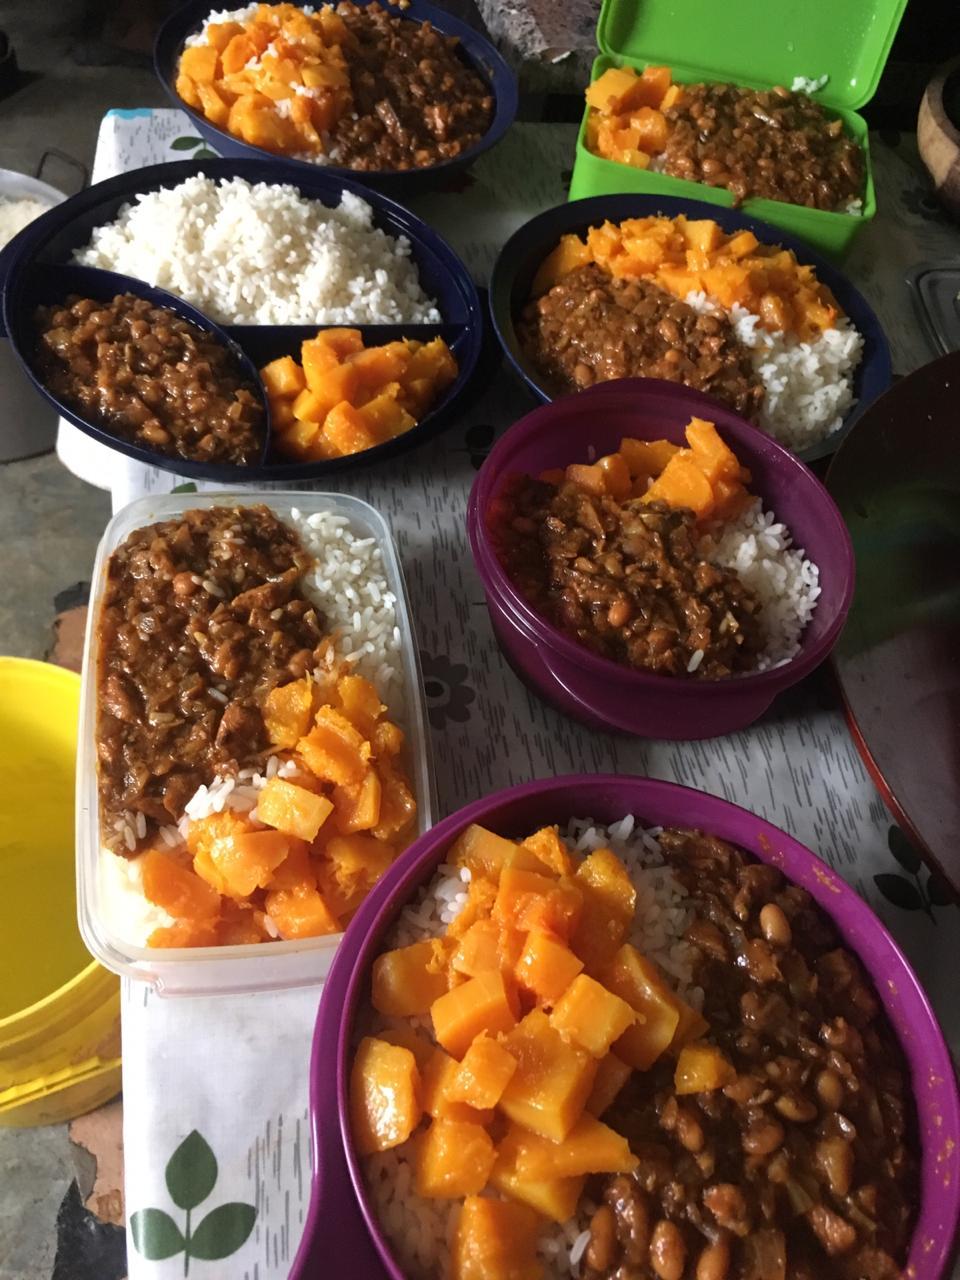 Delicious Nutritious Meals